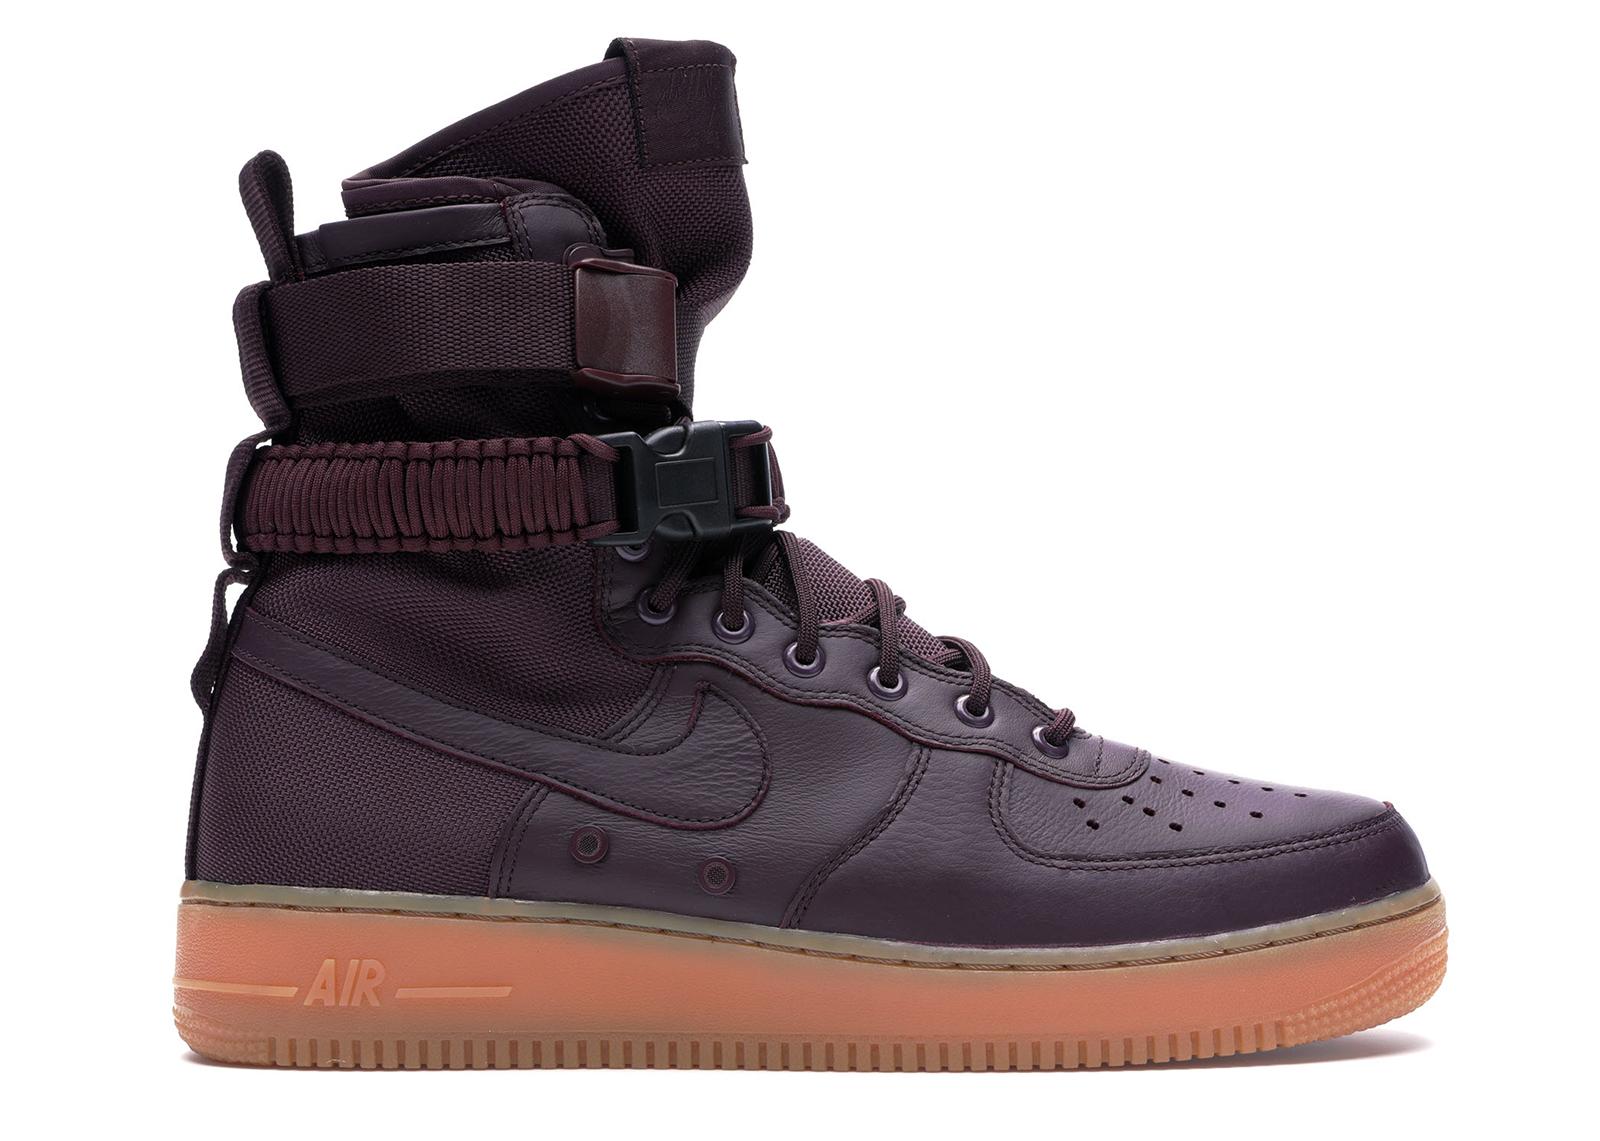 Nike SF Air Force 1 High Deep Burgundy - 864024-600